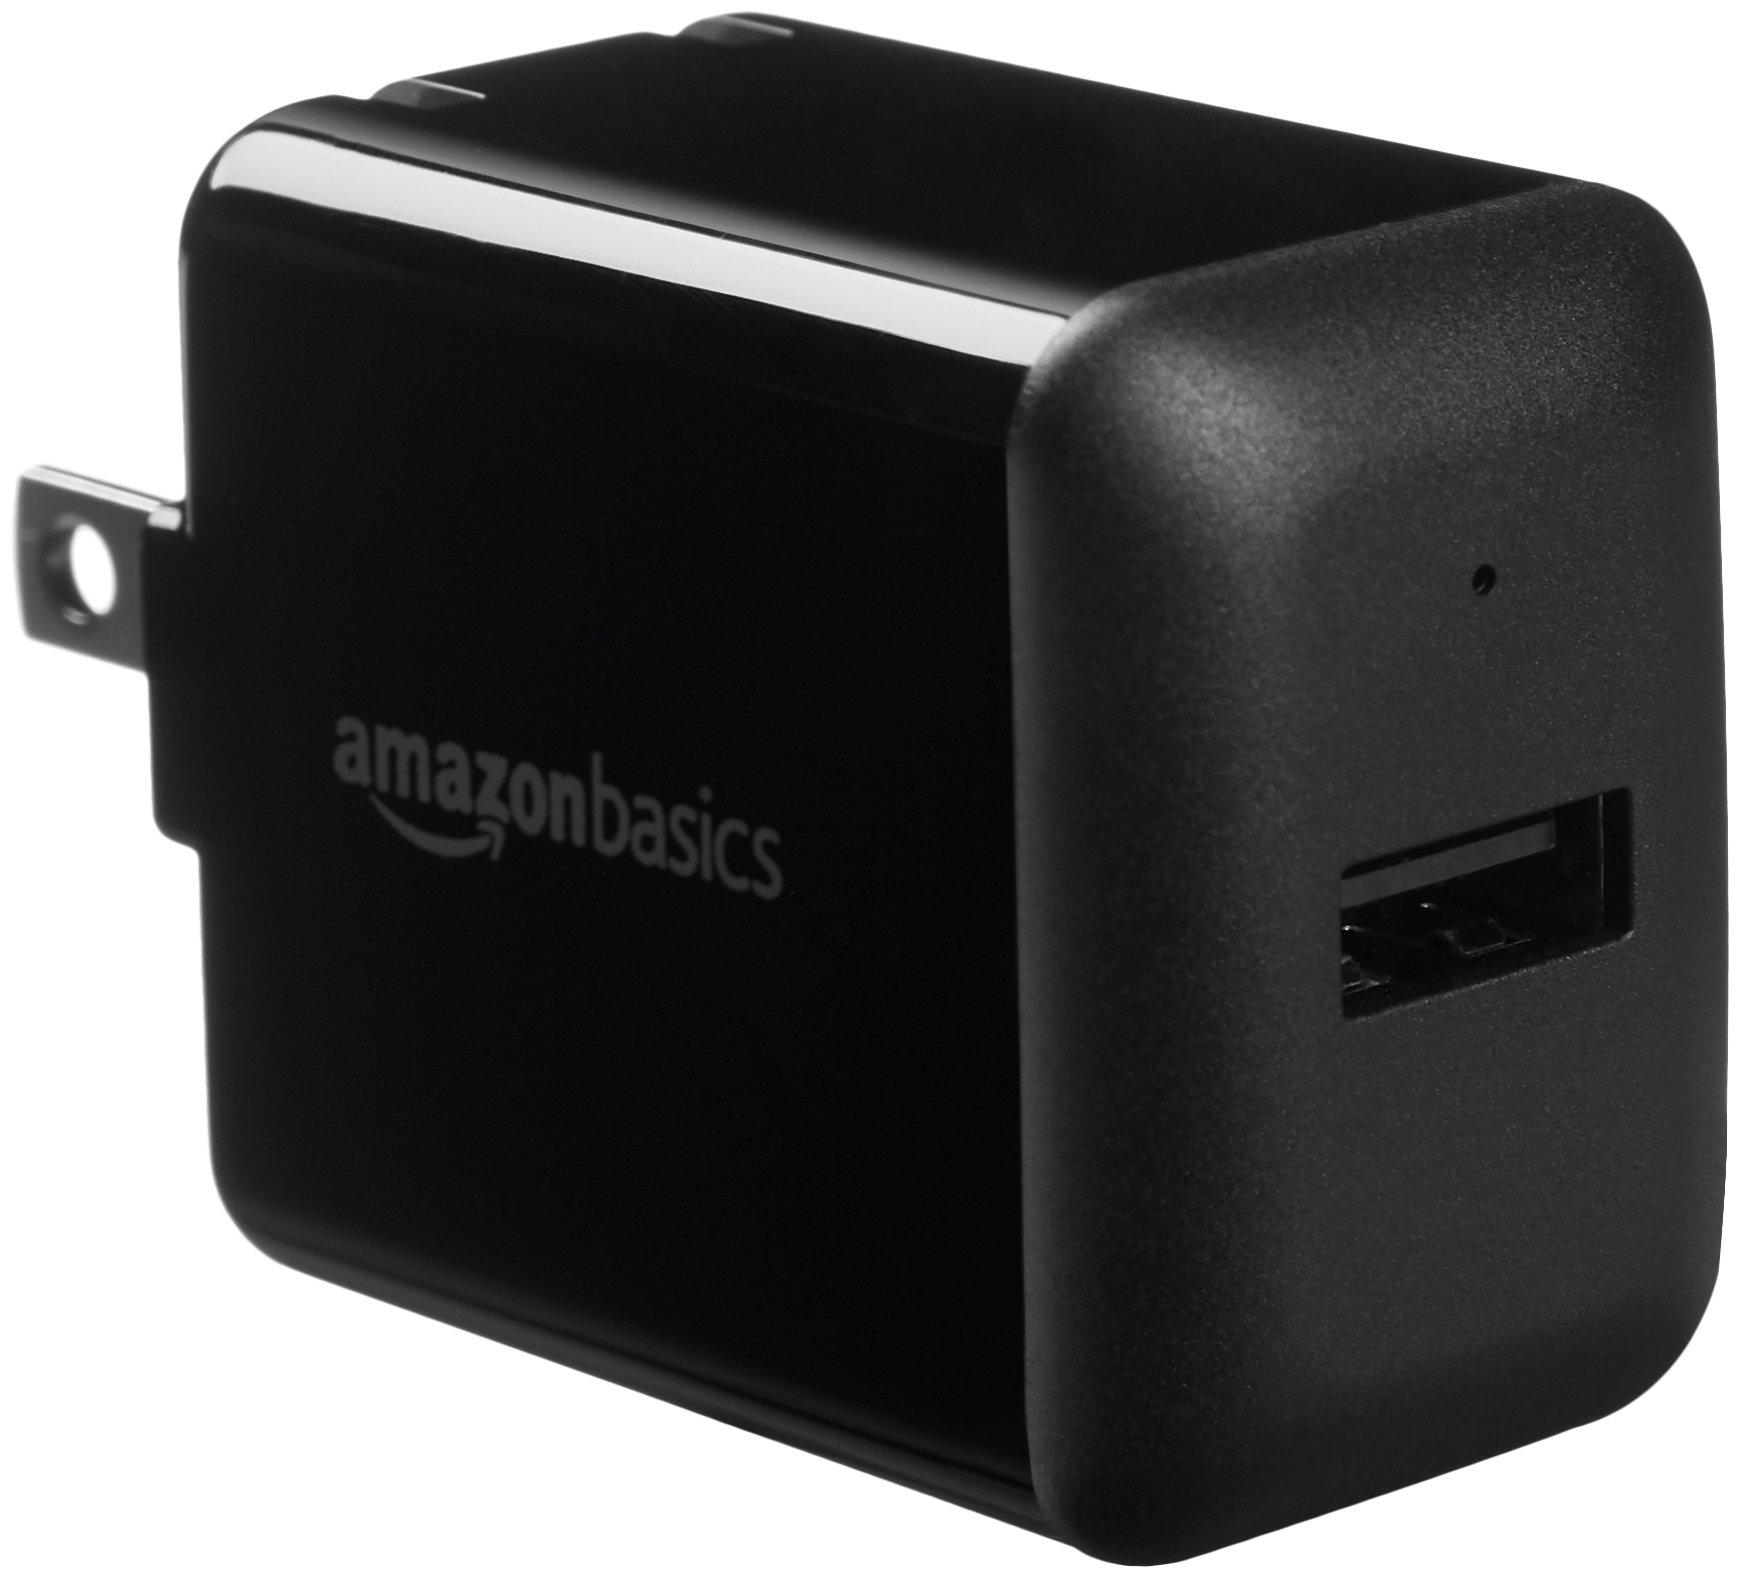 AmazonBasics One Port USB Wall Charger